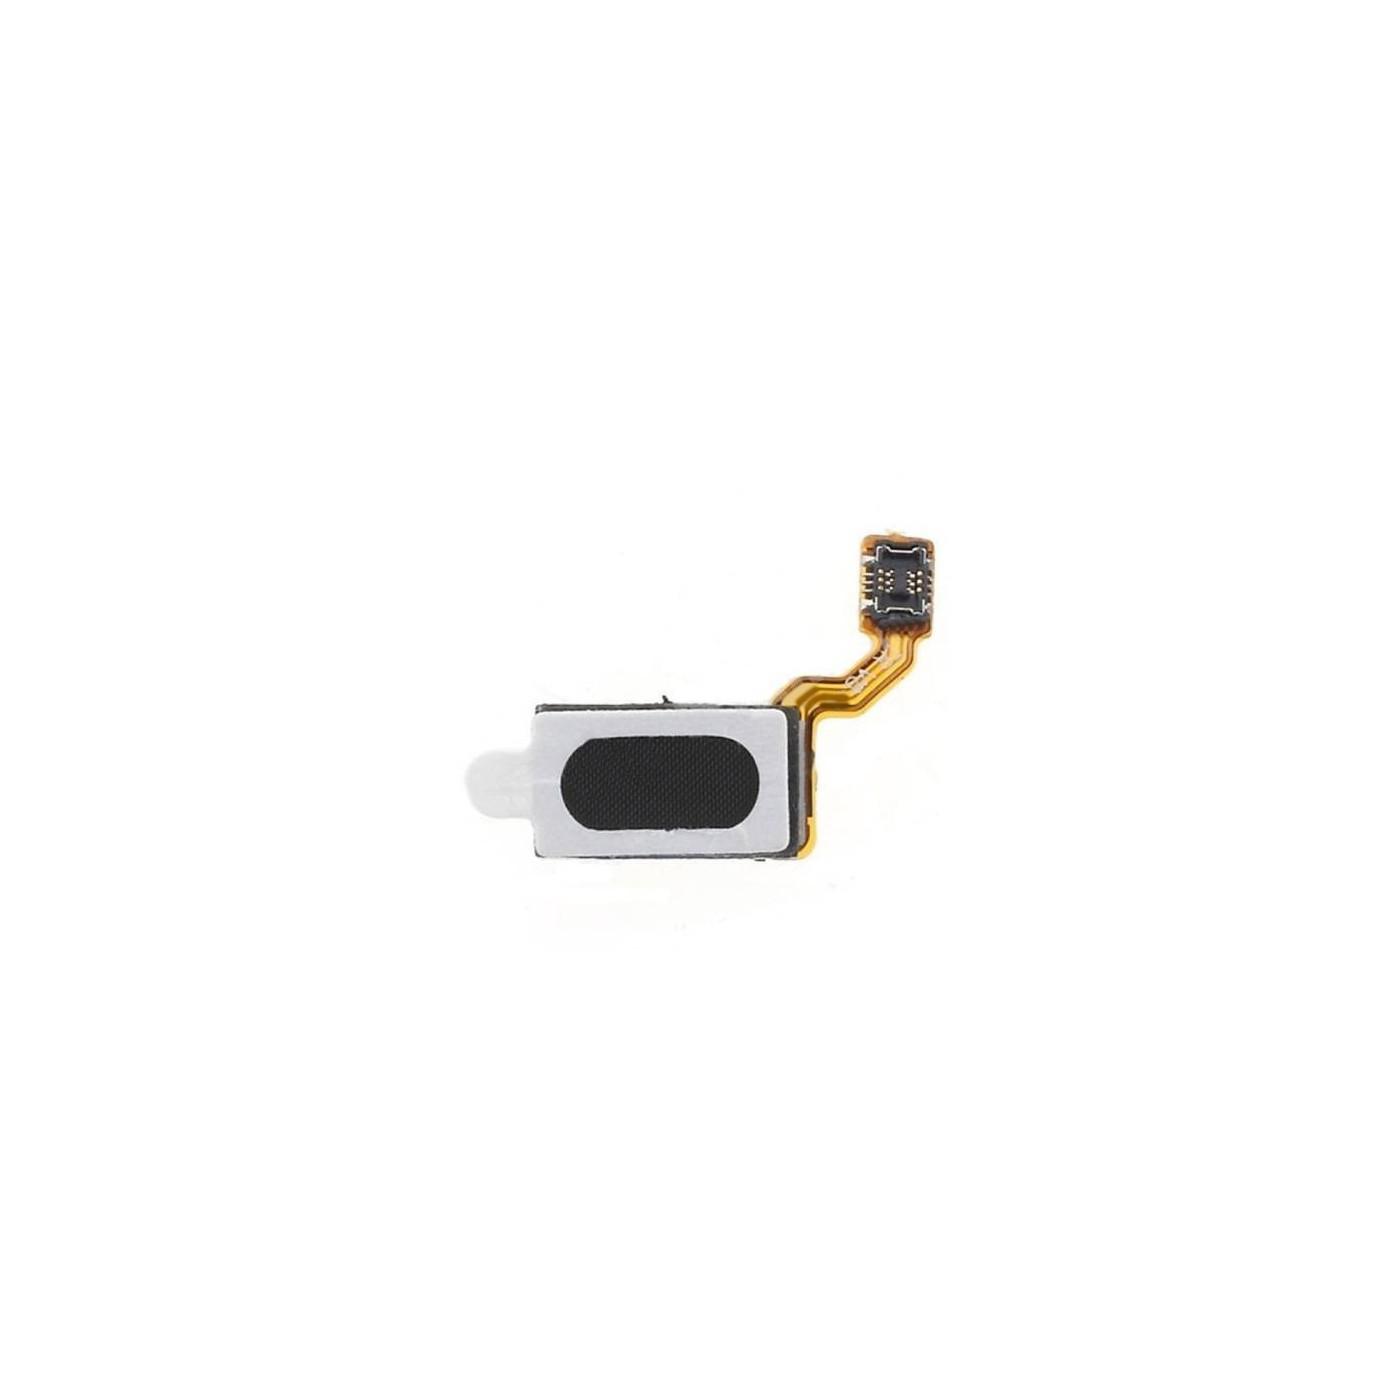 Appel du haut-parleur du Samsung Galaxy Note 4 N910F Flat flex